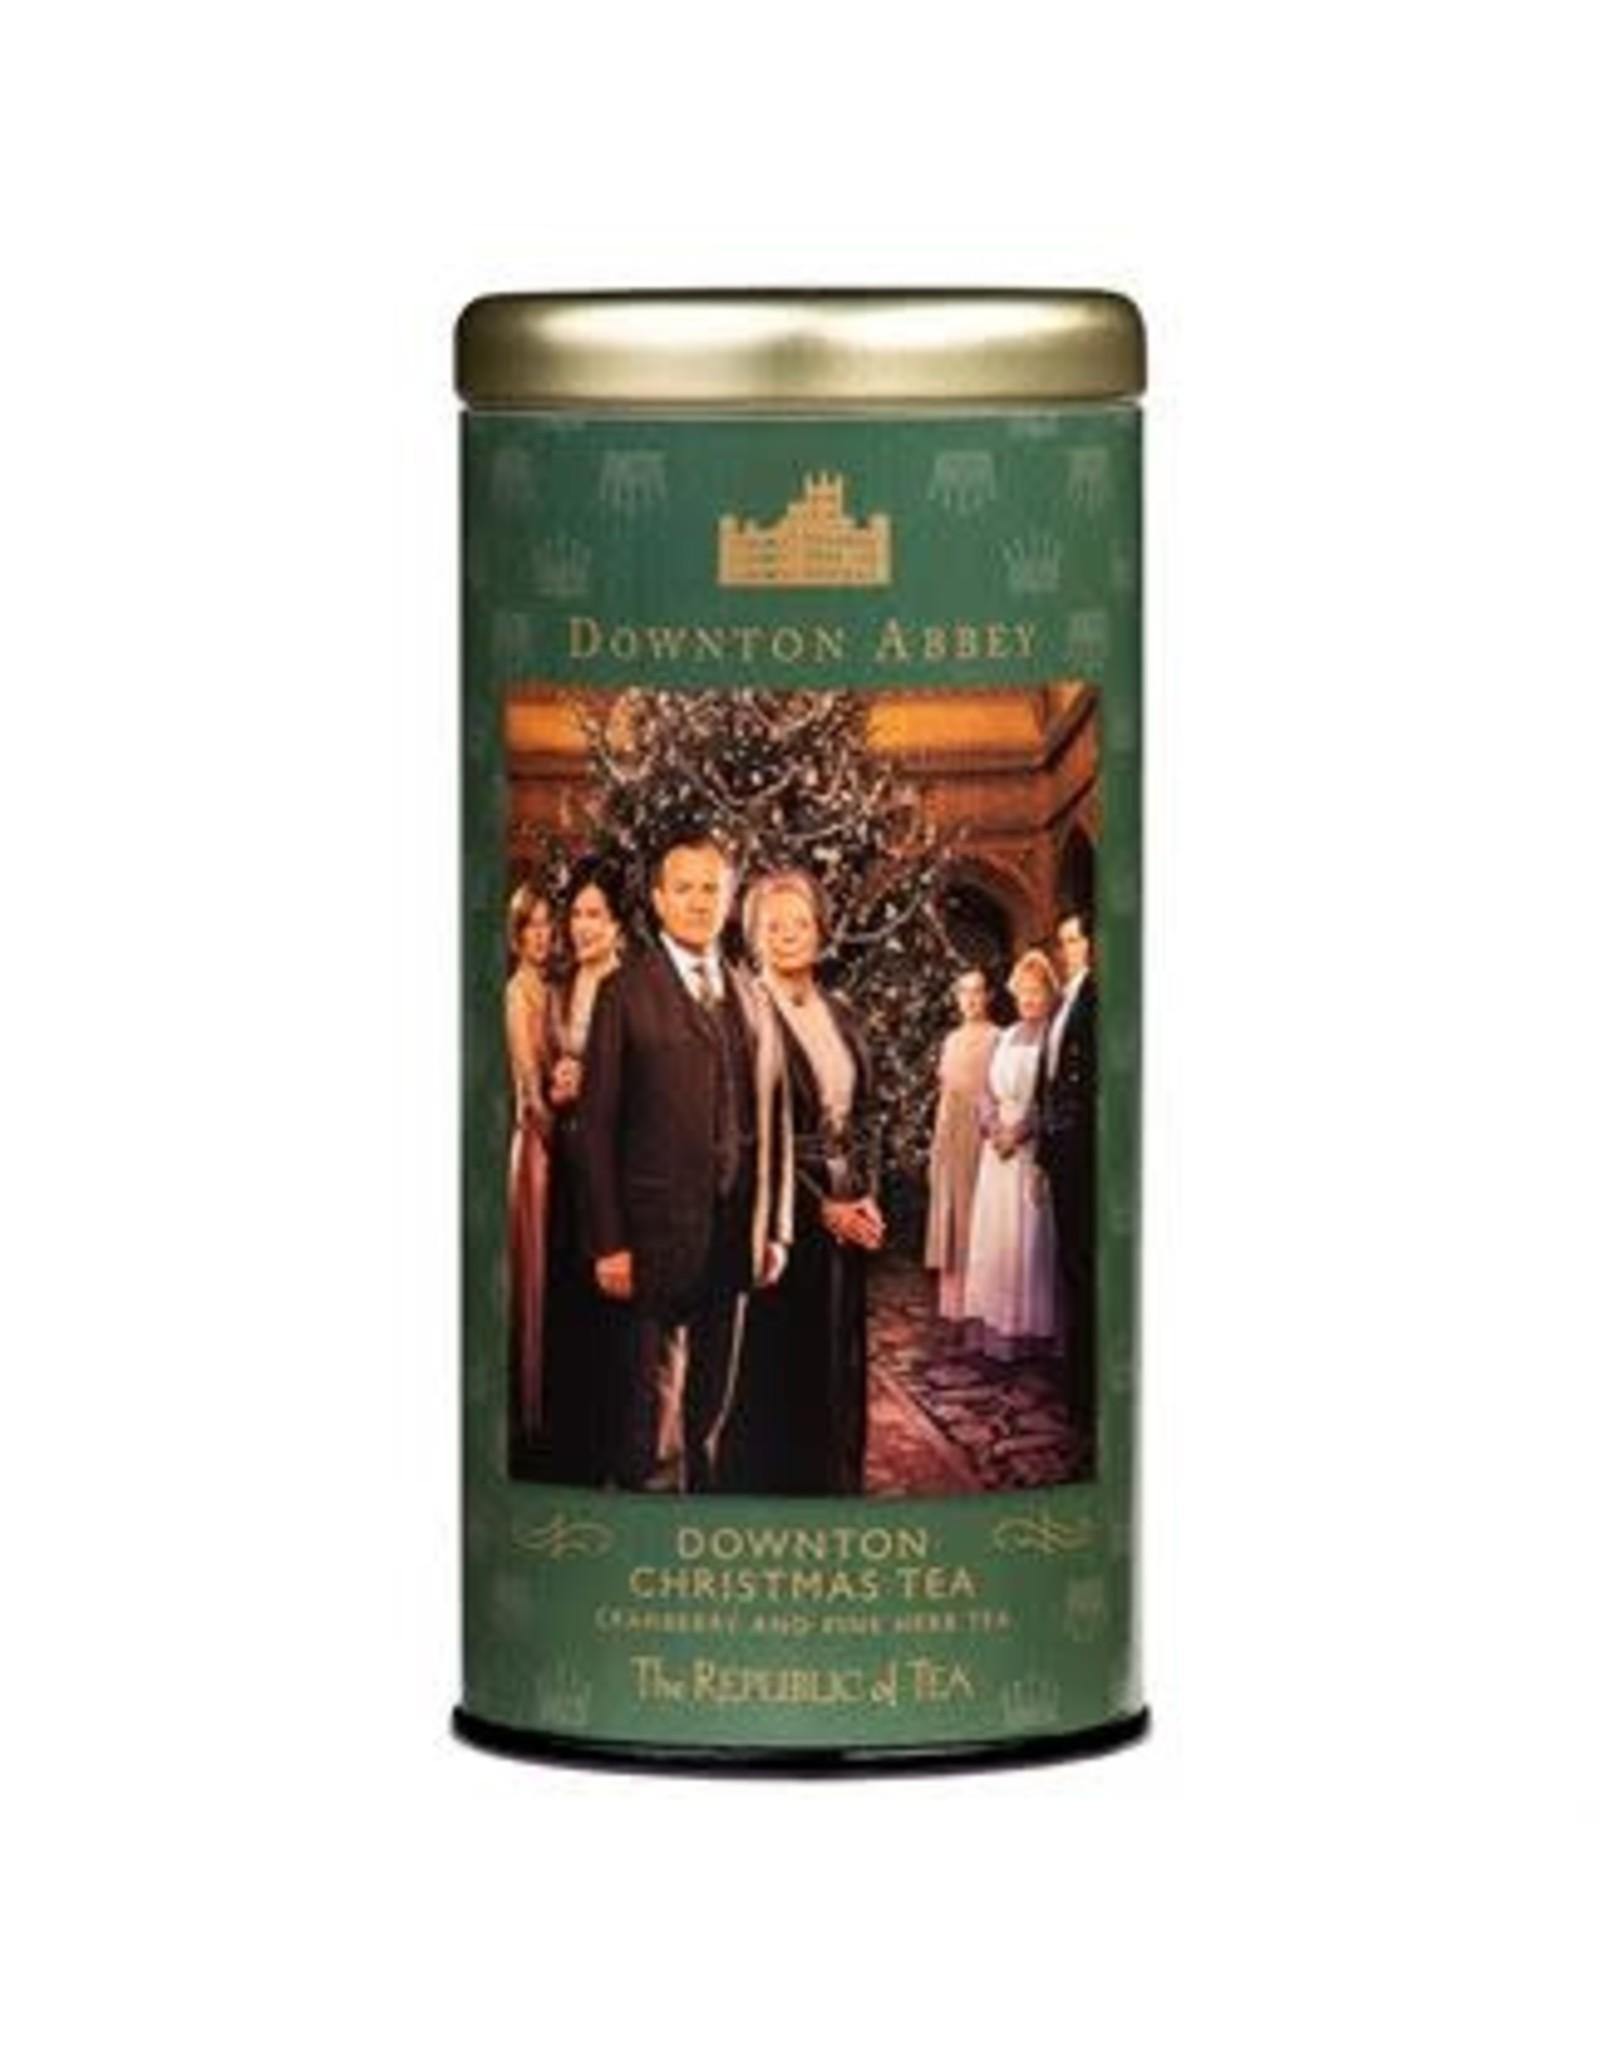 Republic of Tea DOWNTON ABBEY CHRISTMAS TEA